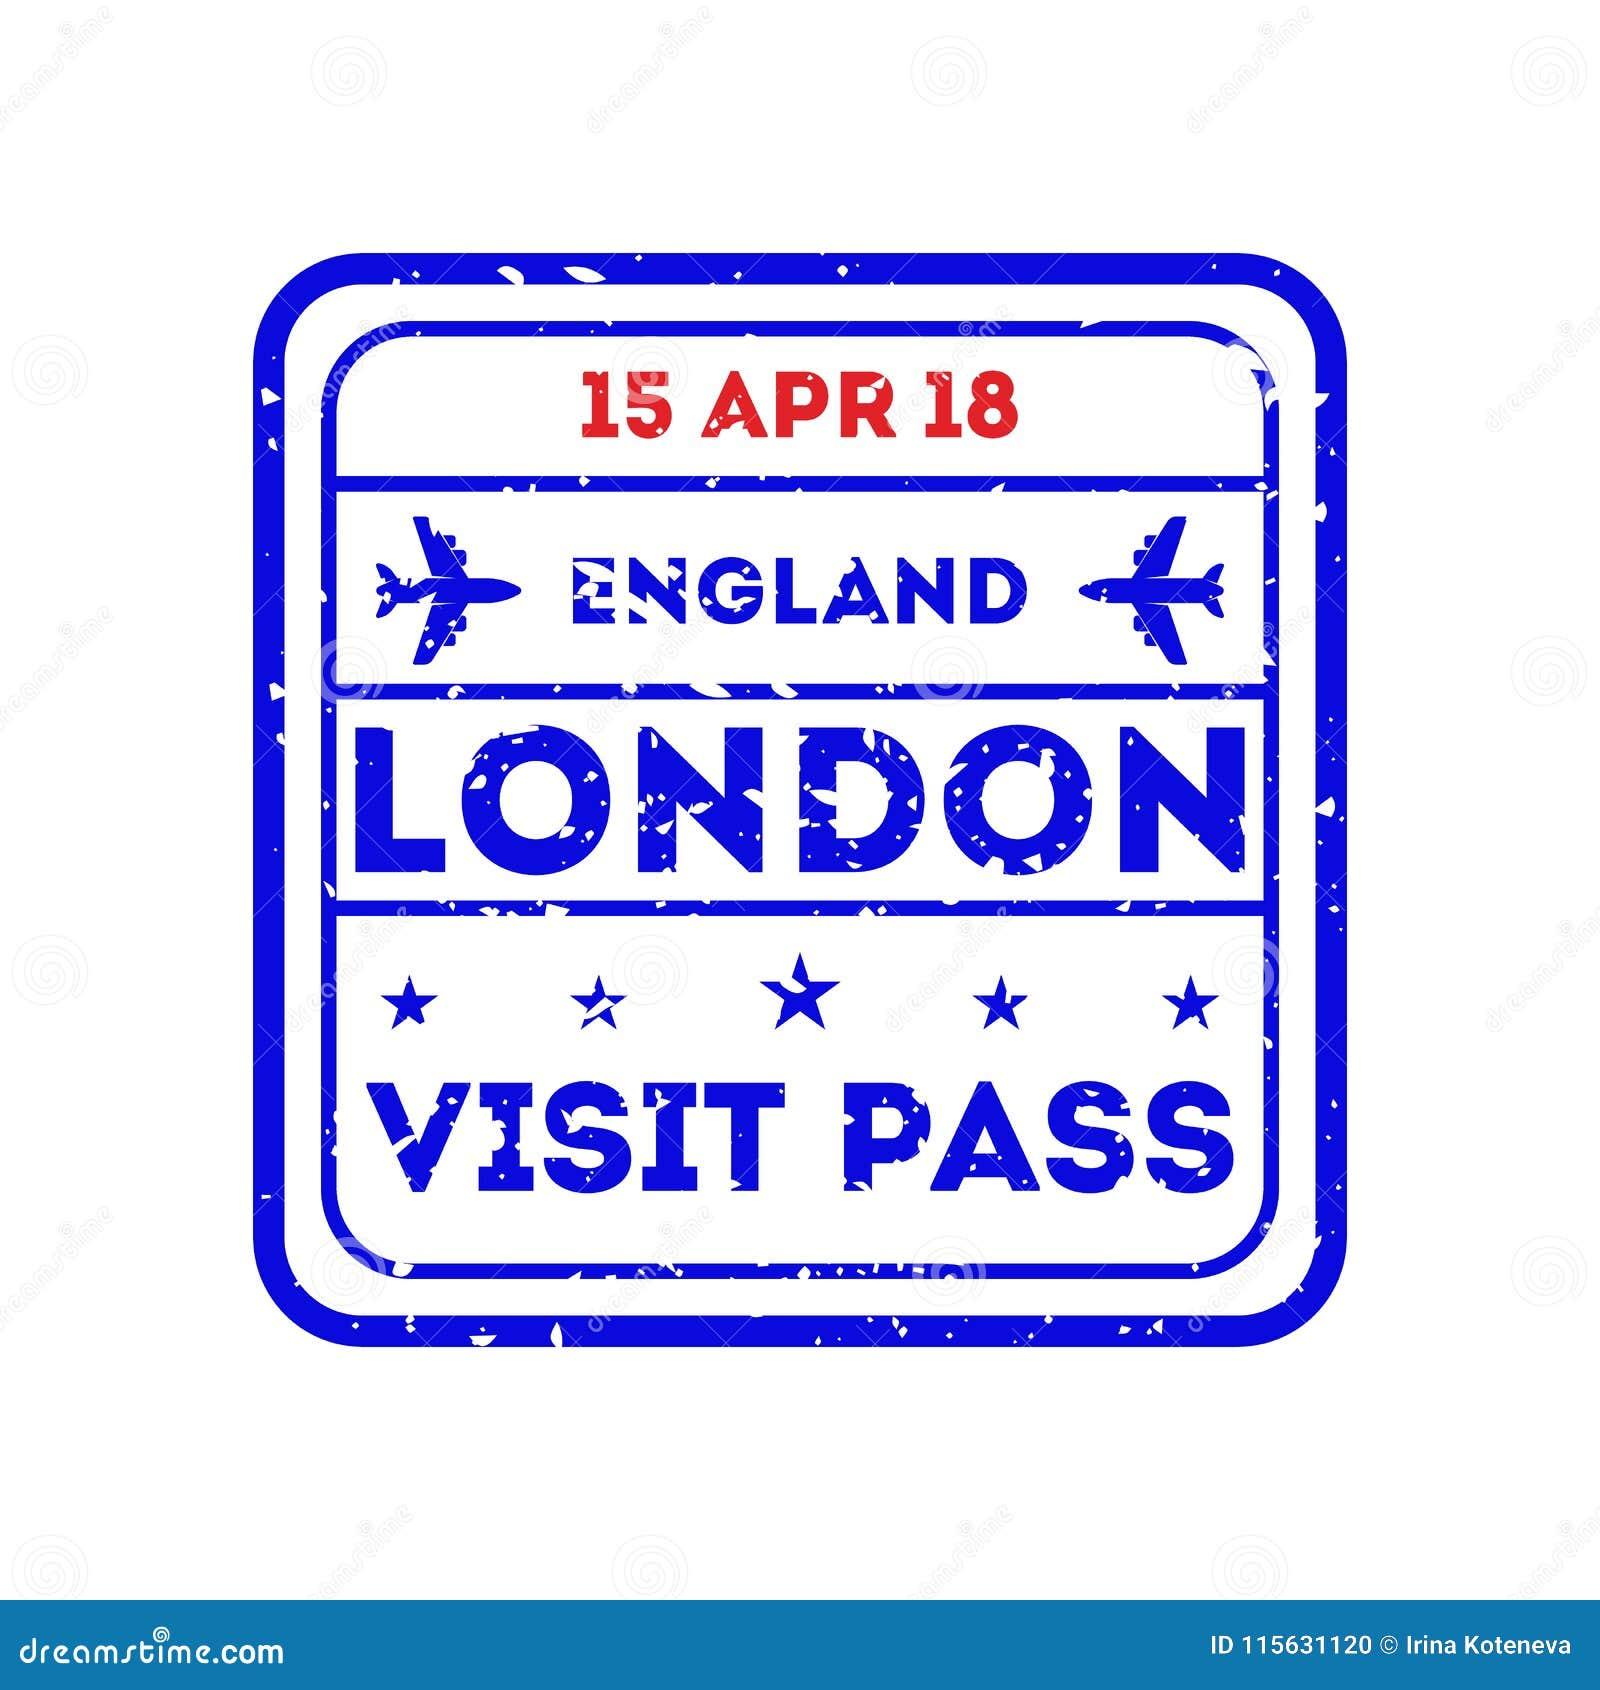 London City Visa Stamp On Passport Stock Vector Illustration Of